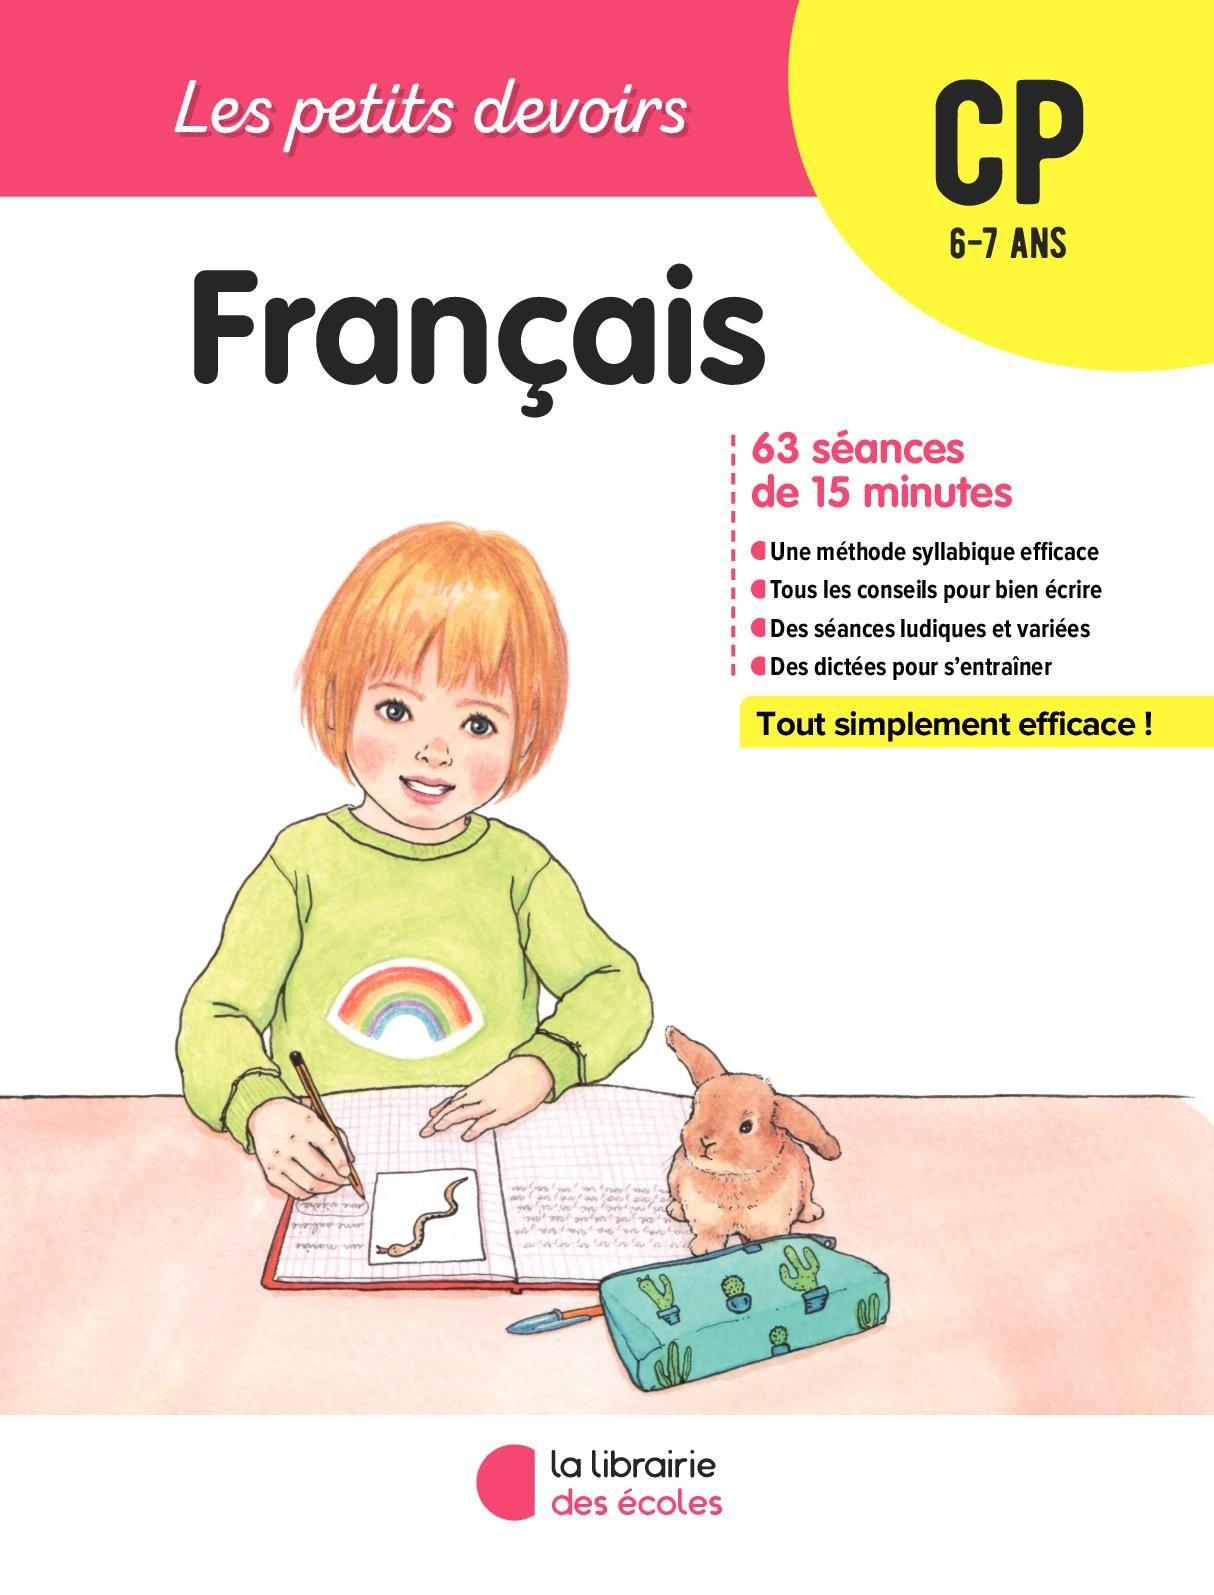 Epingle Sur Francaise Dictionnaire Francais French Learning